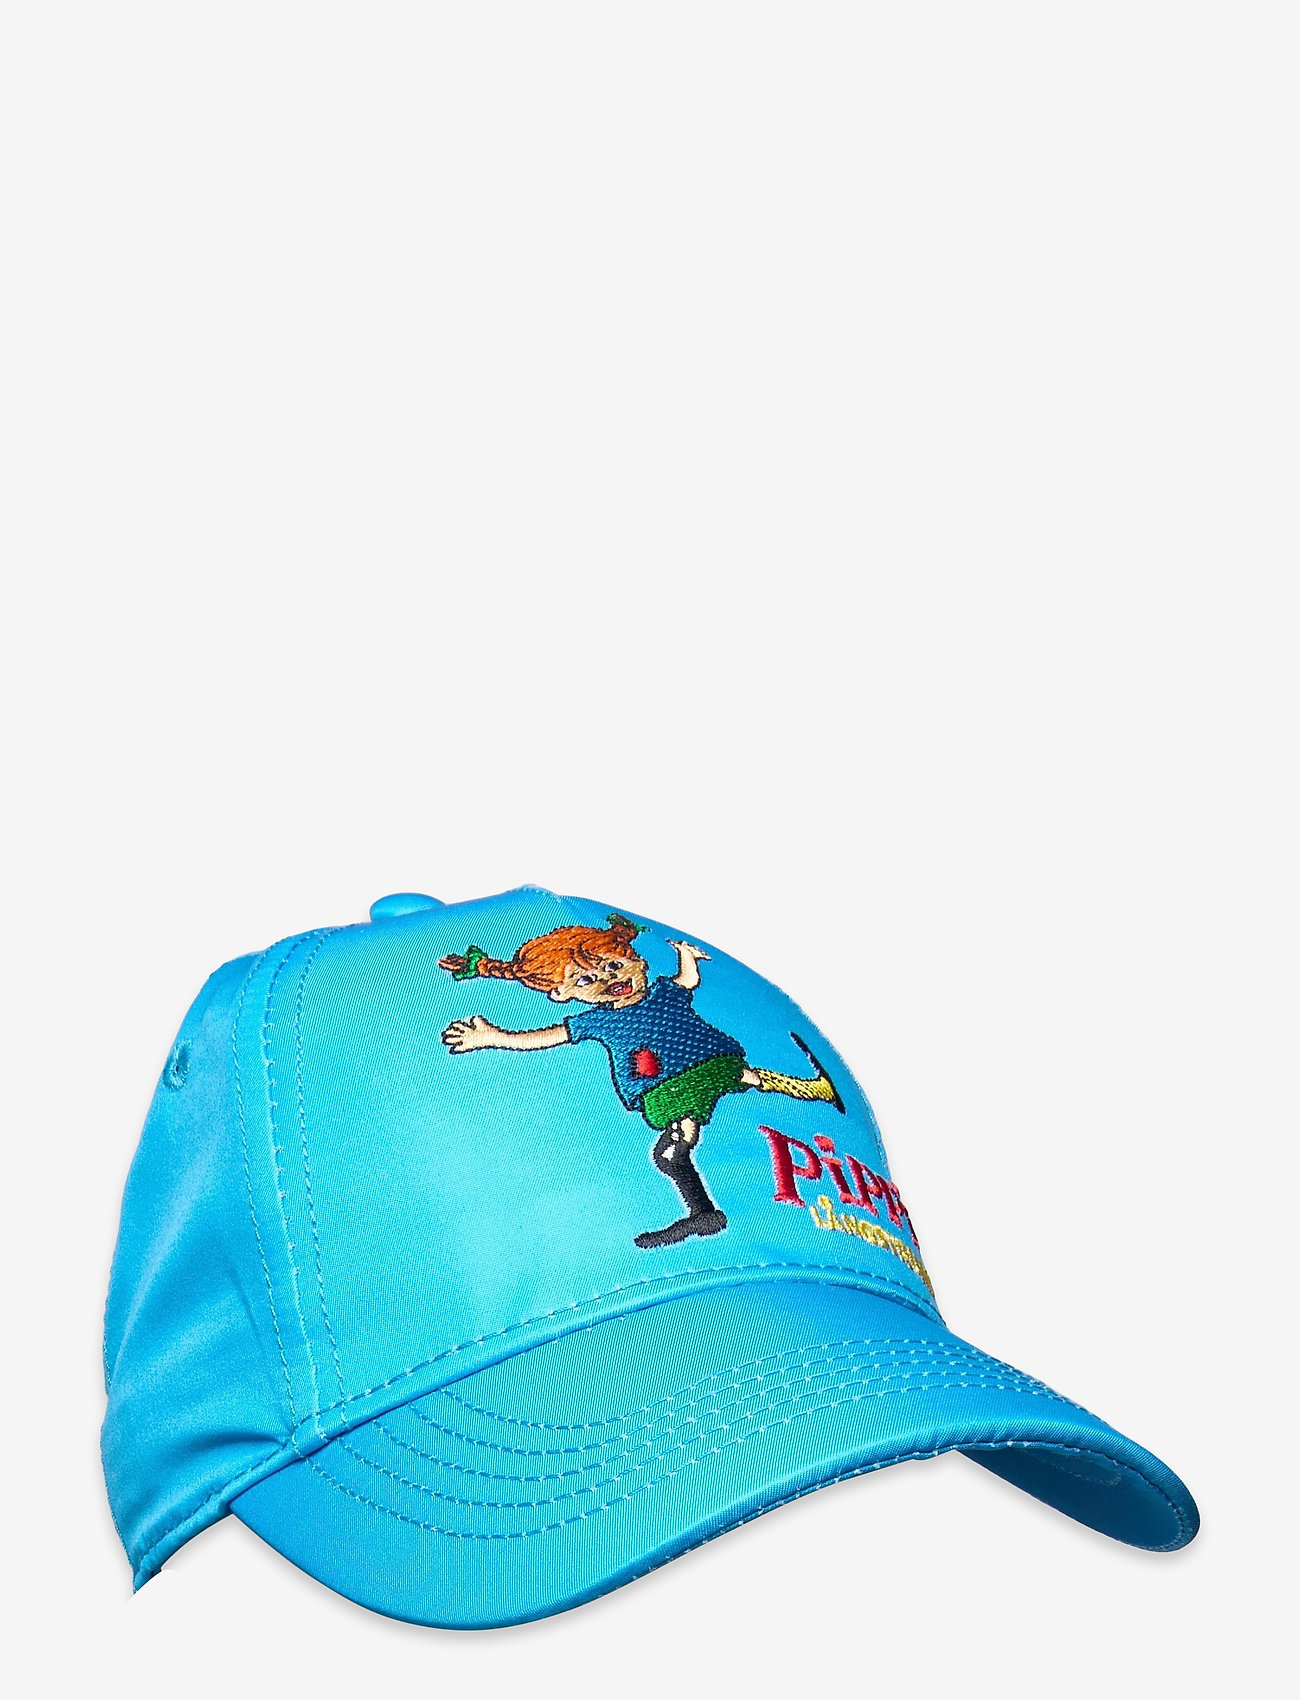 Martinex - OXEYE DAISY HAT - kasketter - blue - 0